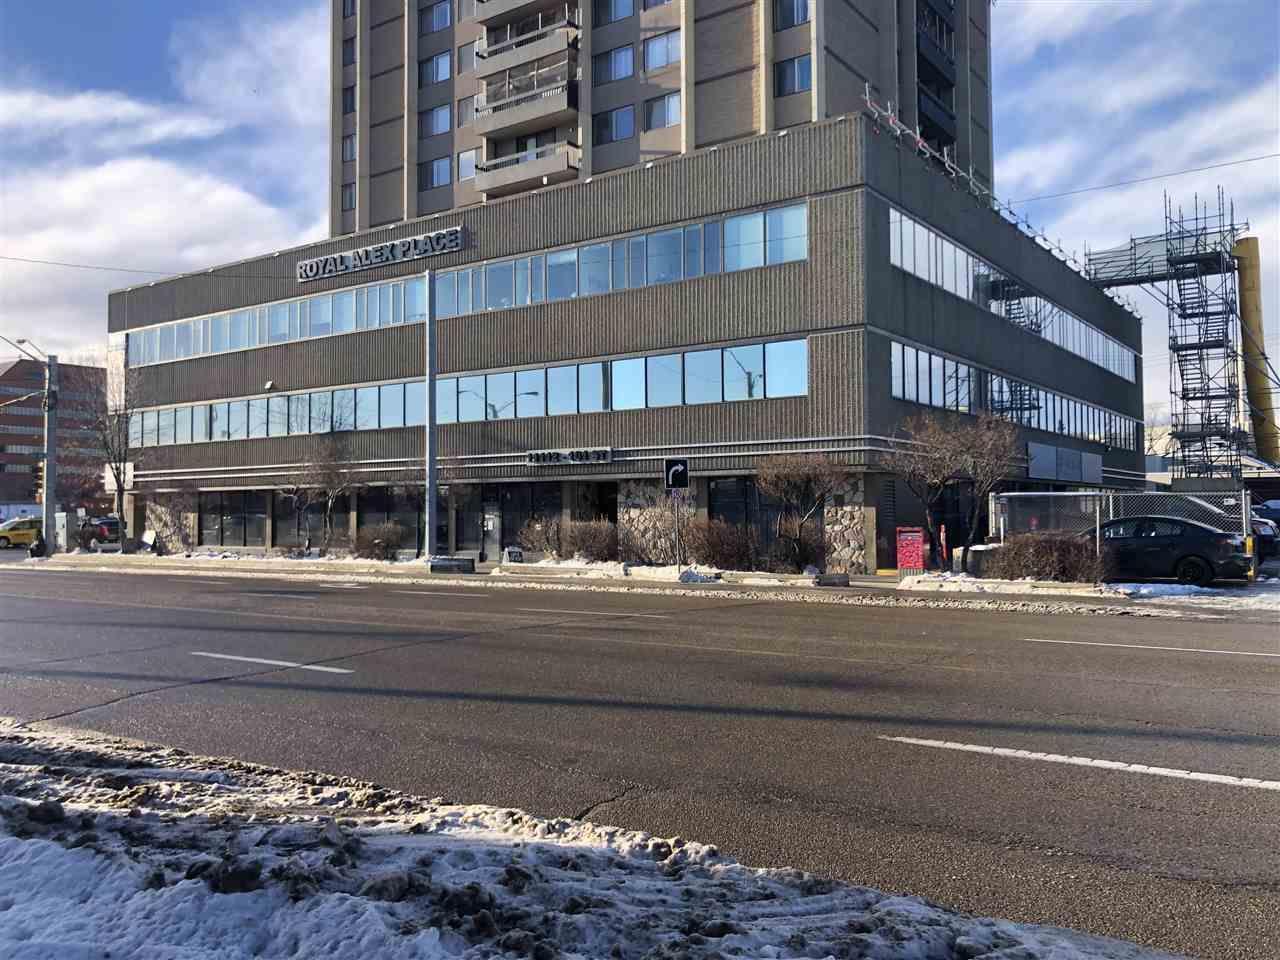 10106 111 Av Nw Nw, Edmonton, Alberta  T5G 0B3 - Photo 5 - E4146980